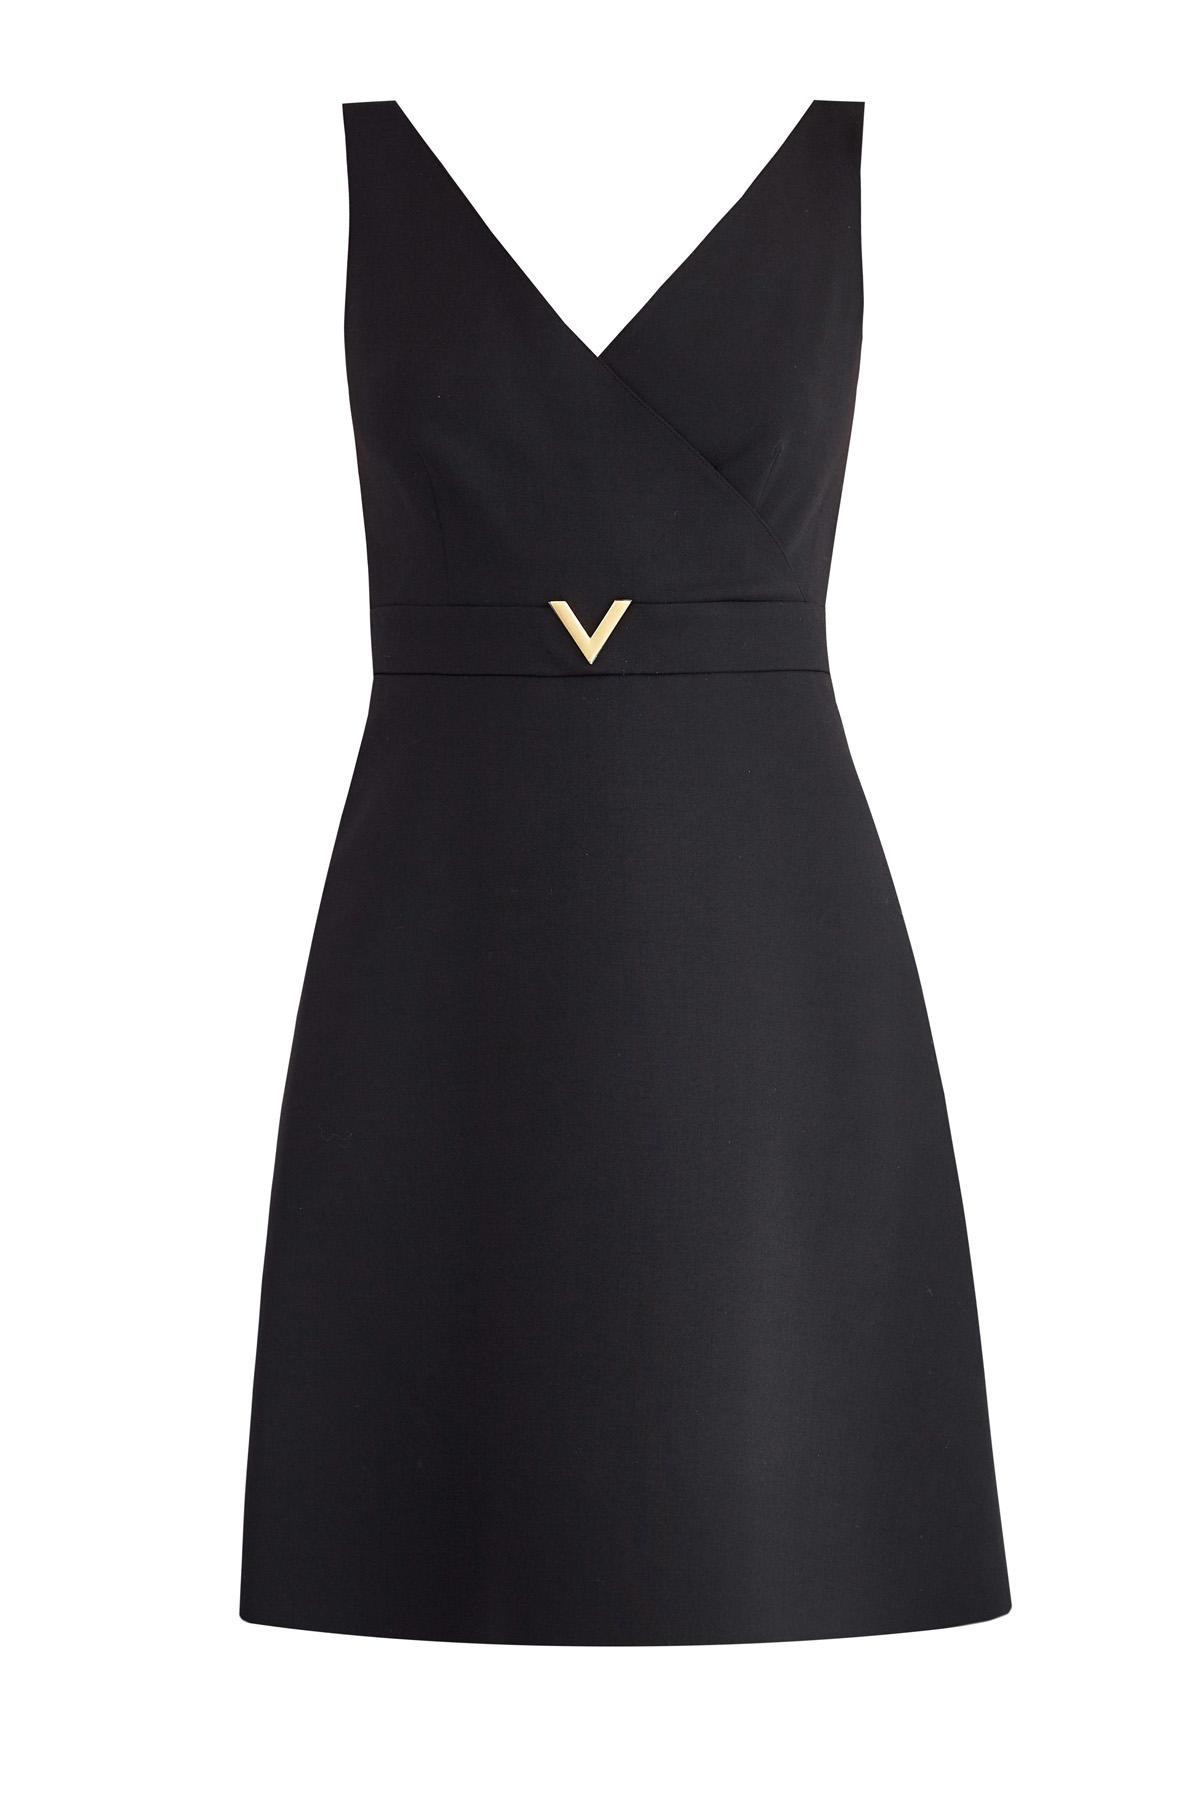 Платье на запах с широкими бретелями и литым символом V фото